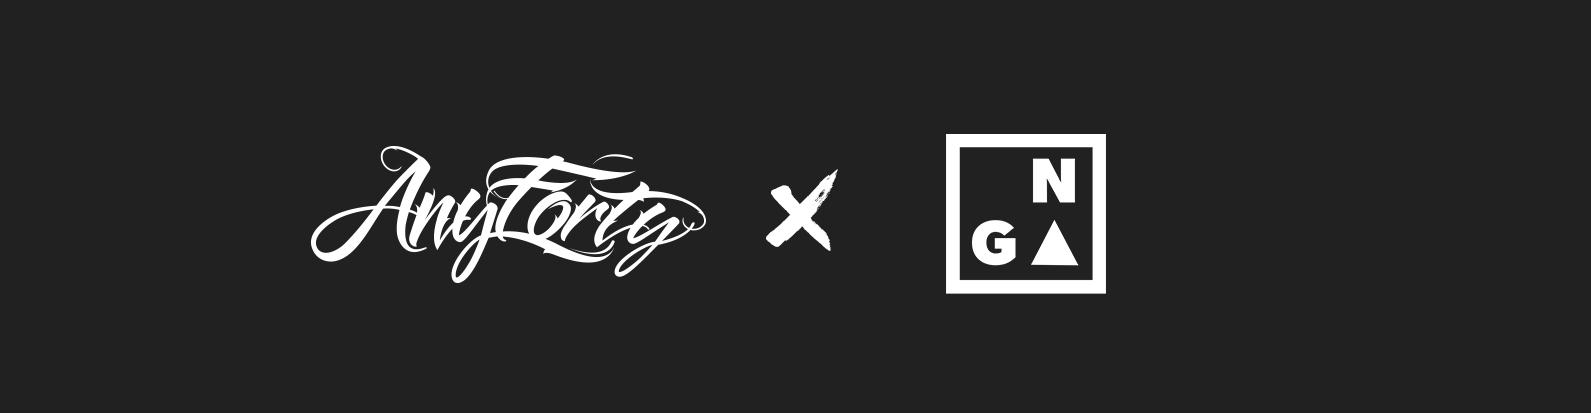 AnyForty_Logo_1.jpg